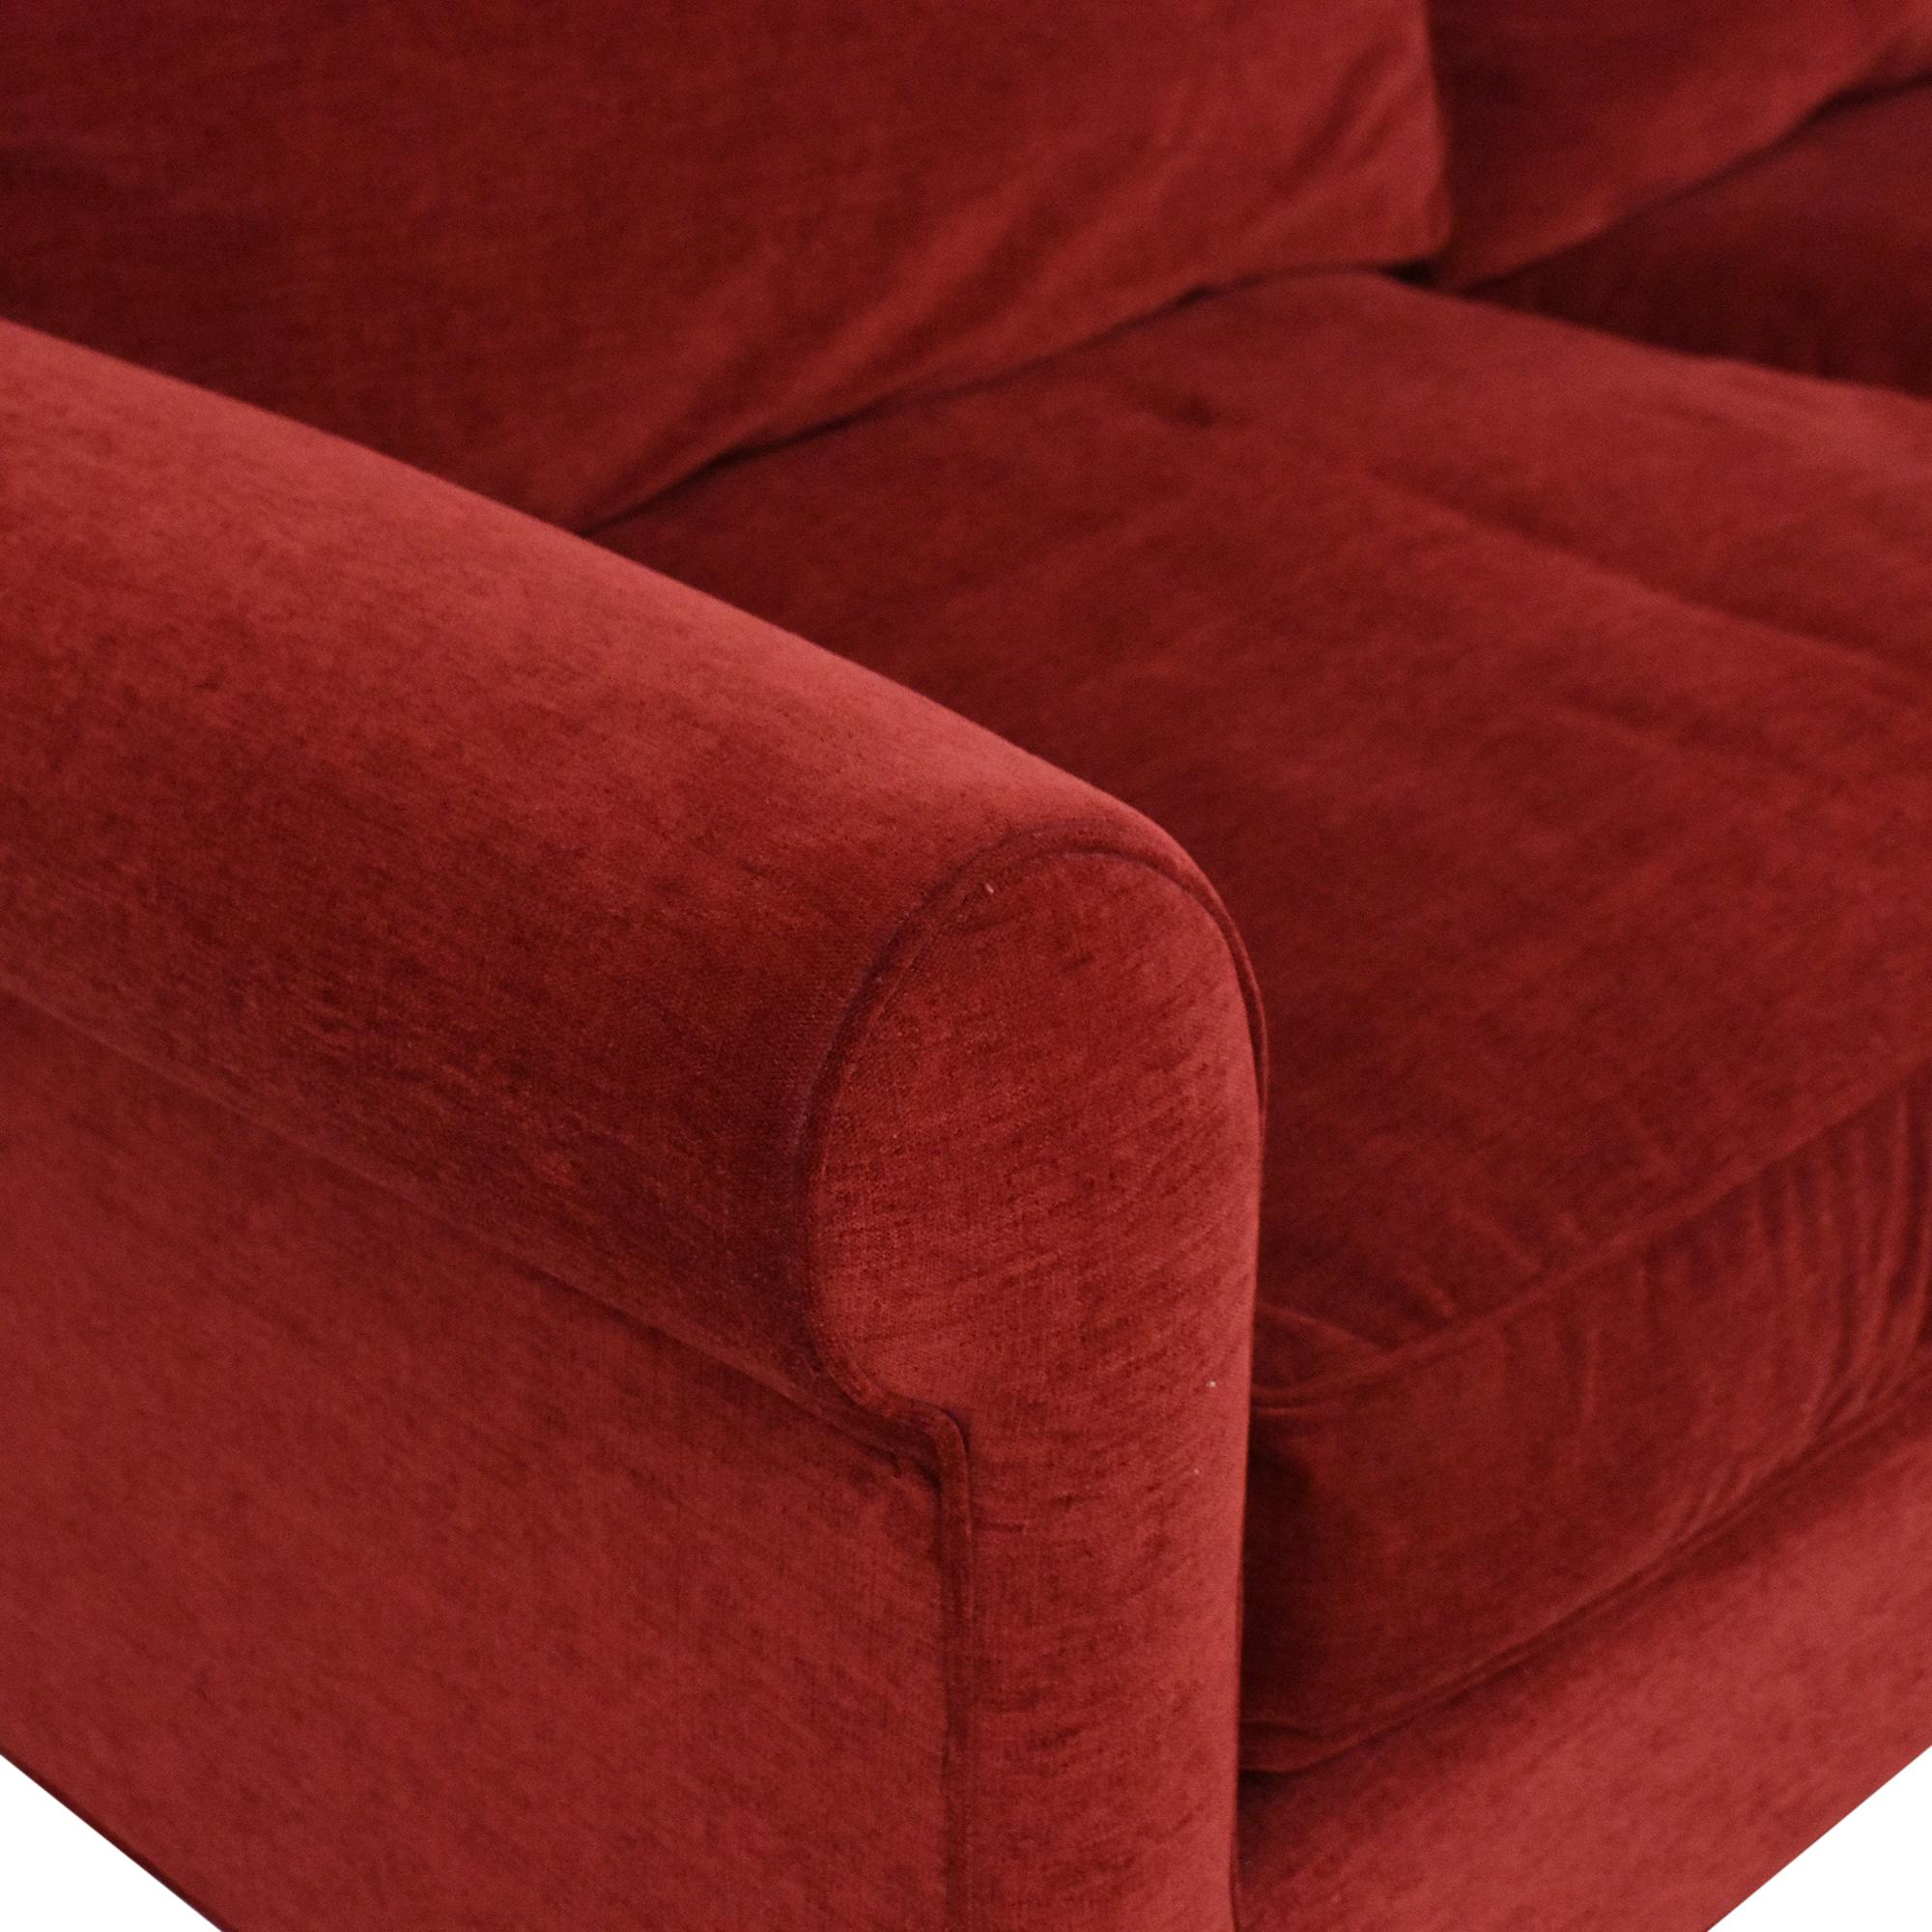 Lillian August Lillian August Roll Arm Sofa red